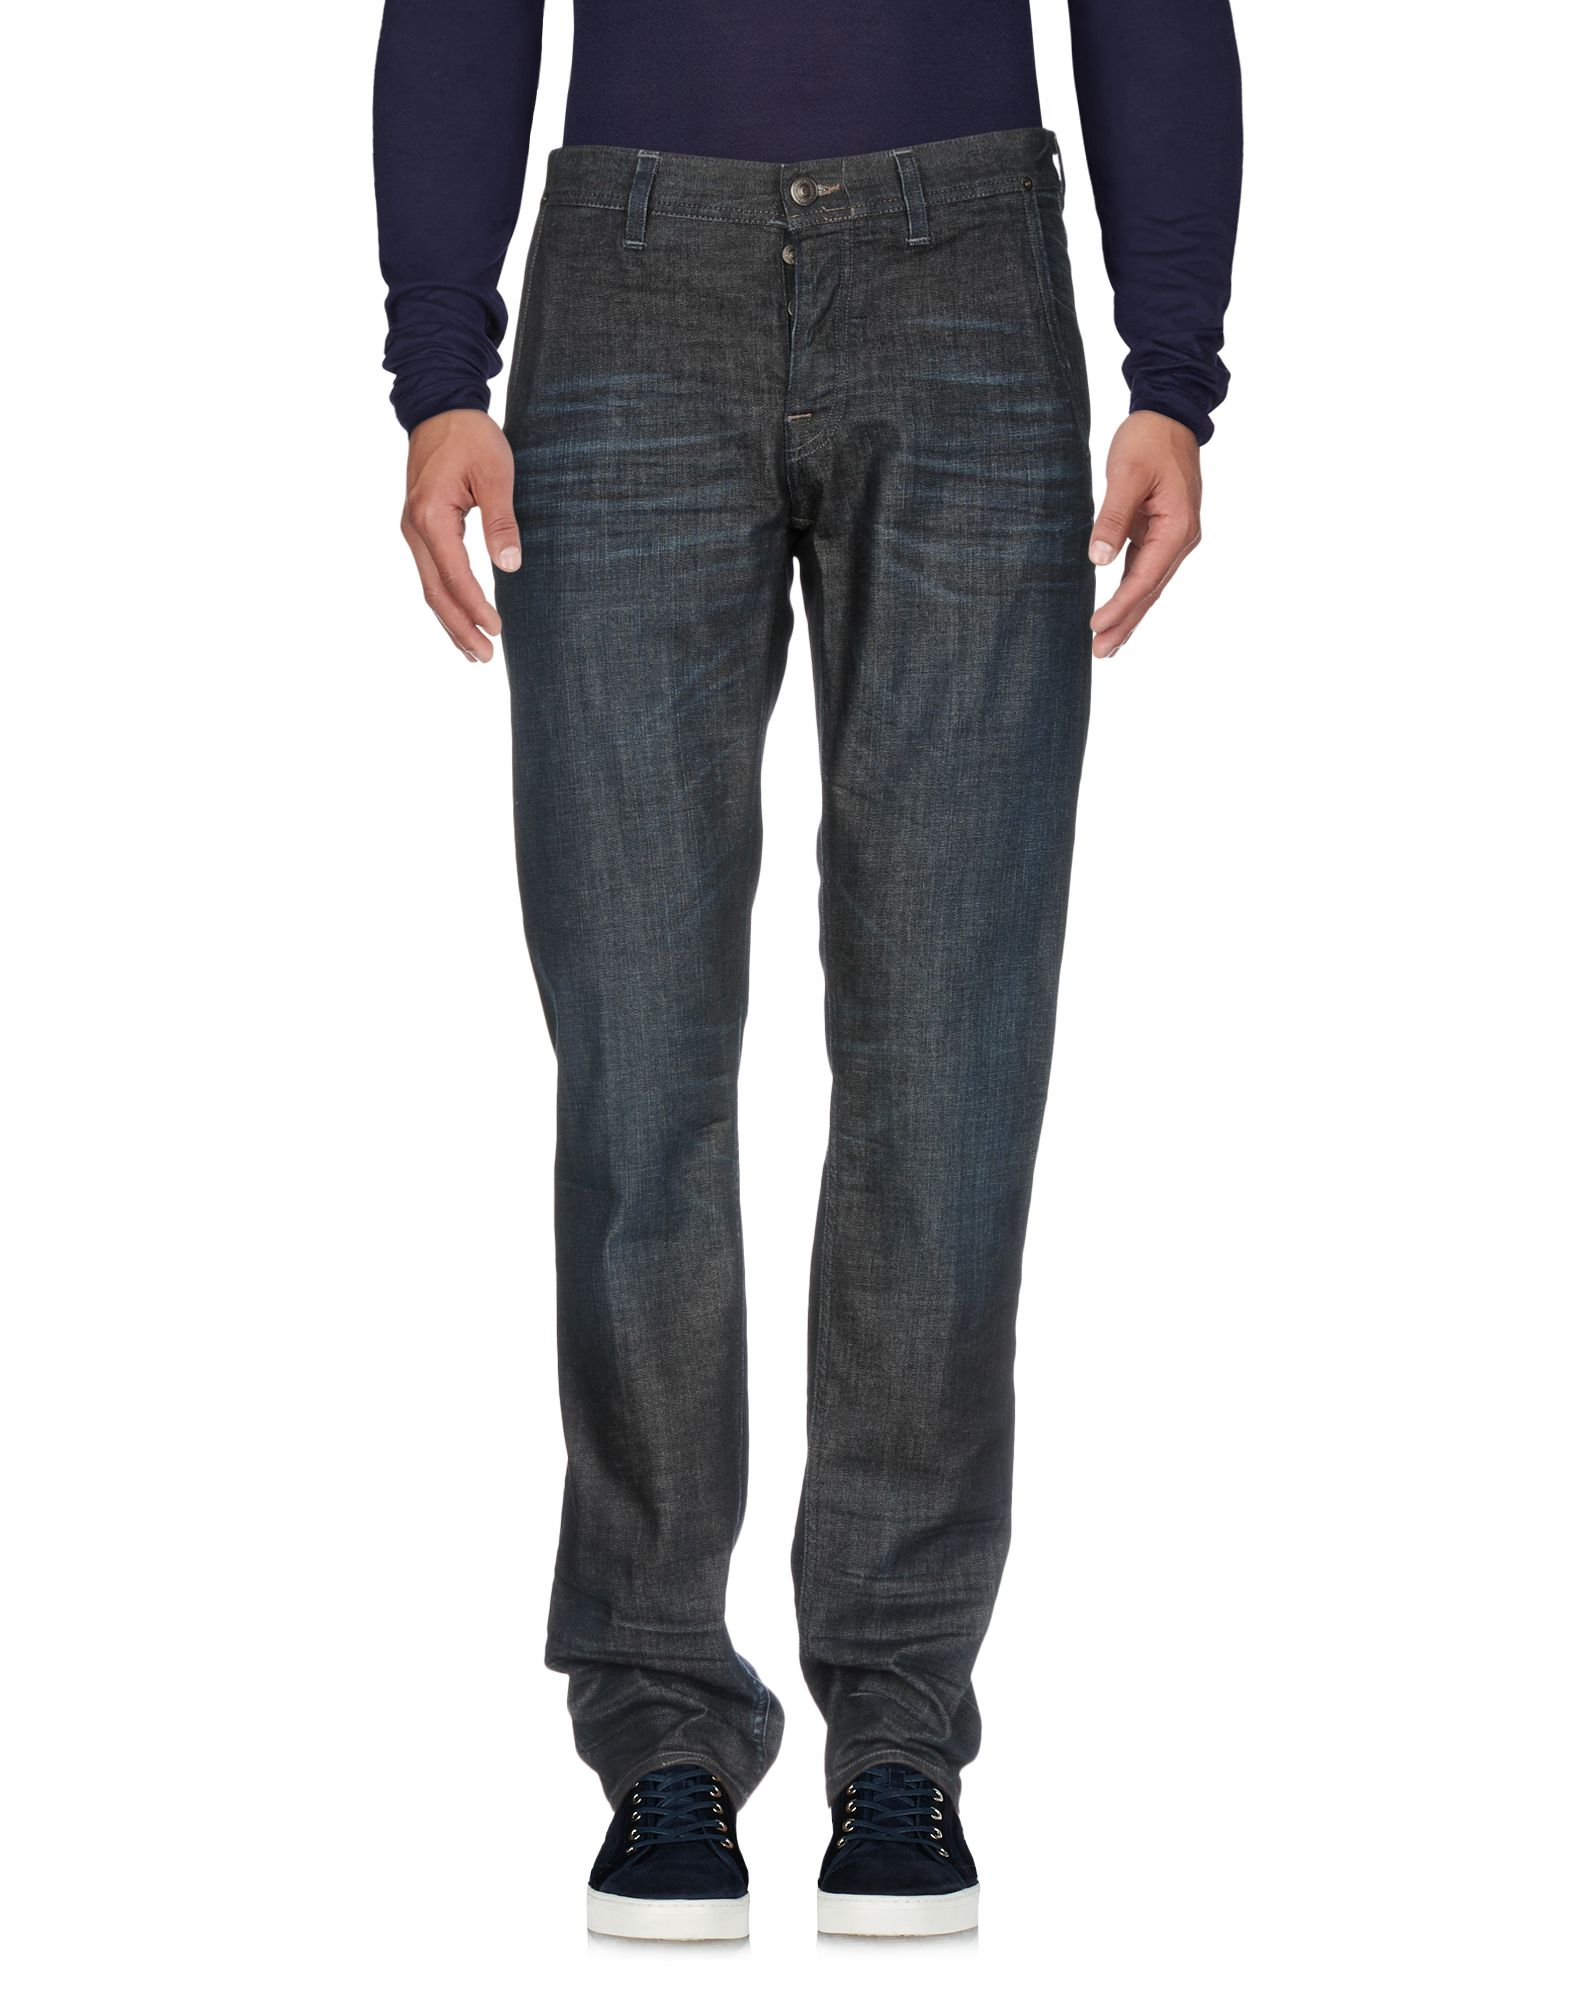 Pantaloni Jeans Care Label Uomo Uomo Uomo - 42674044EU bea051